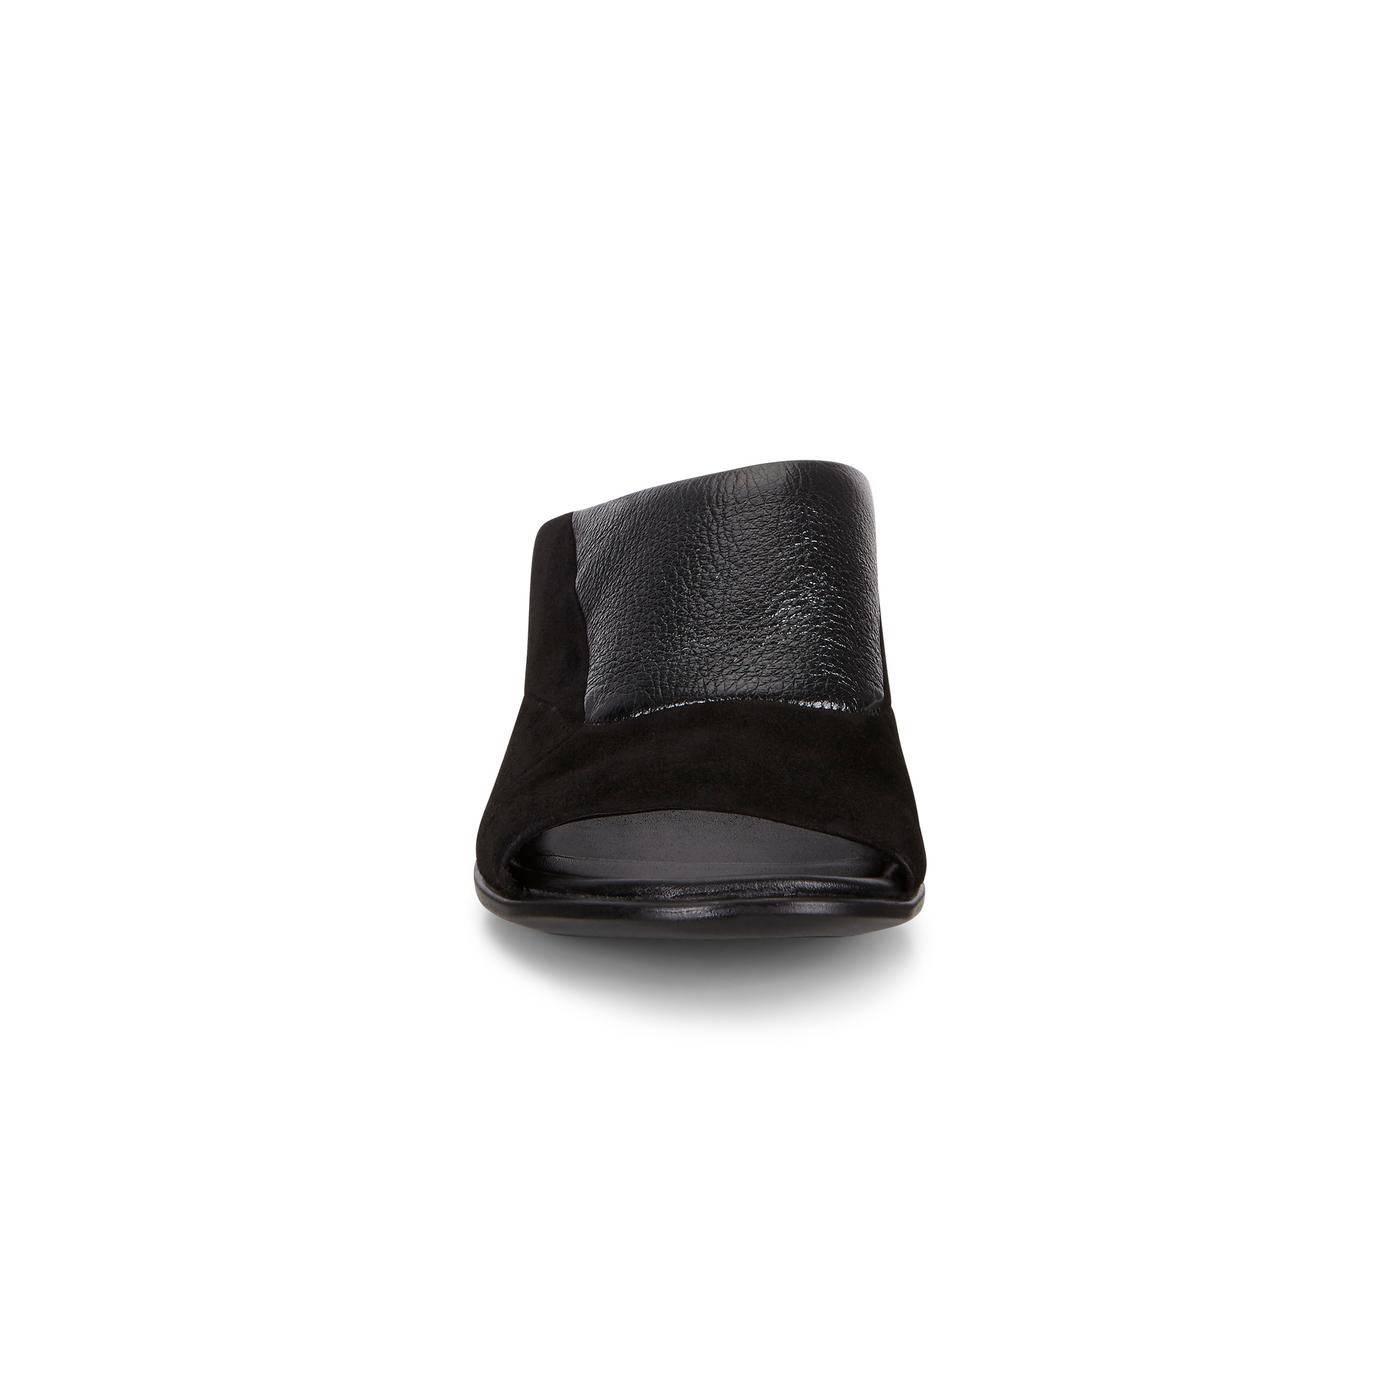 ECCO SHAPE BLOCK SANDAL Sabo 35mm